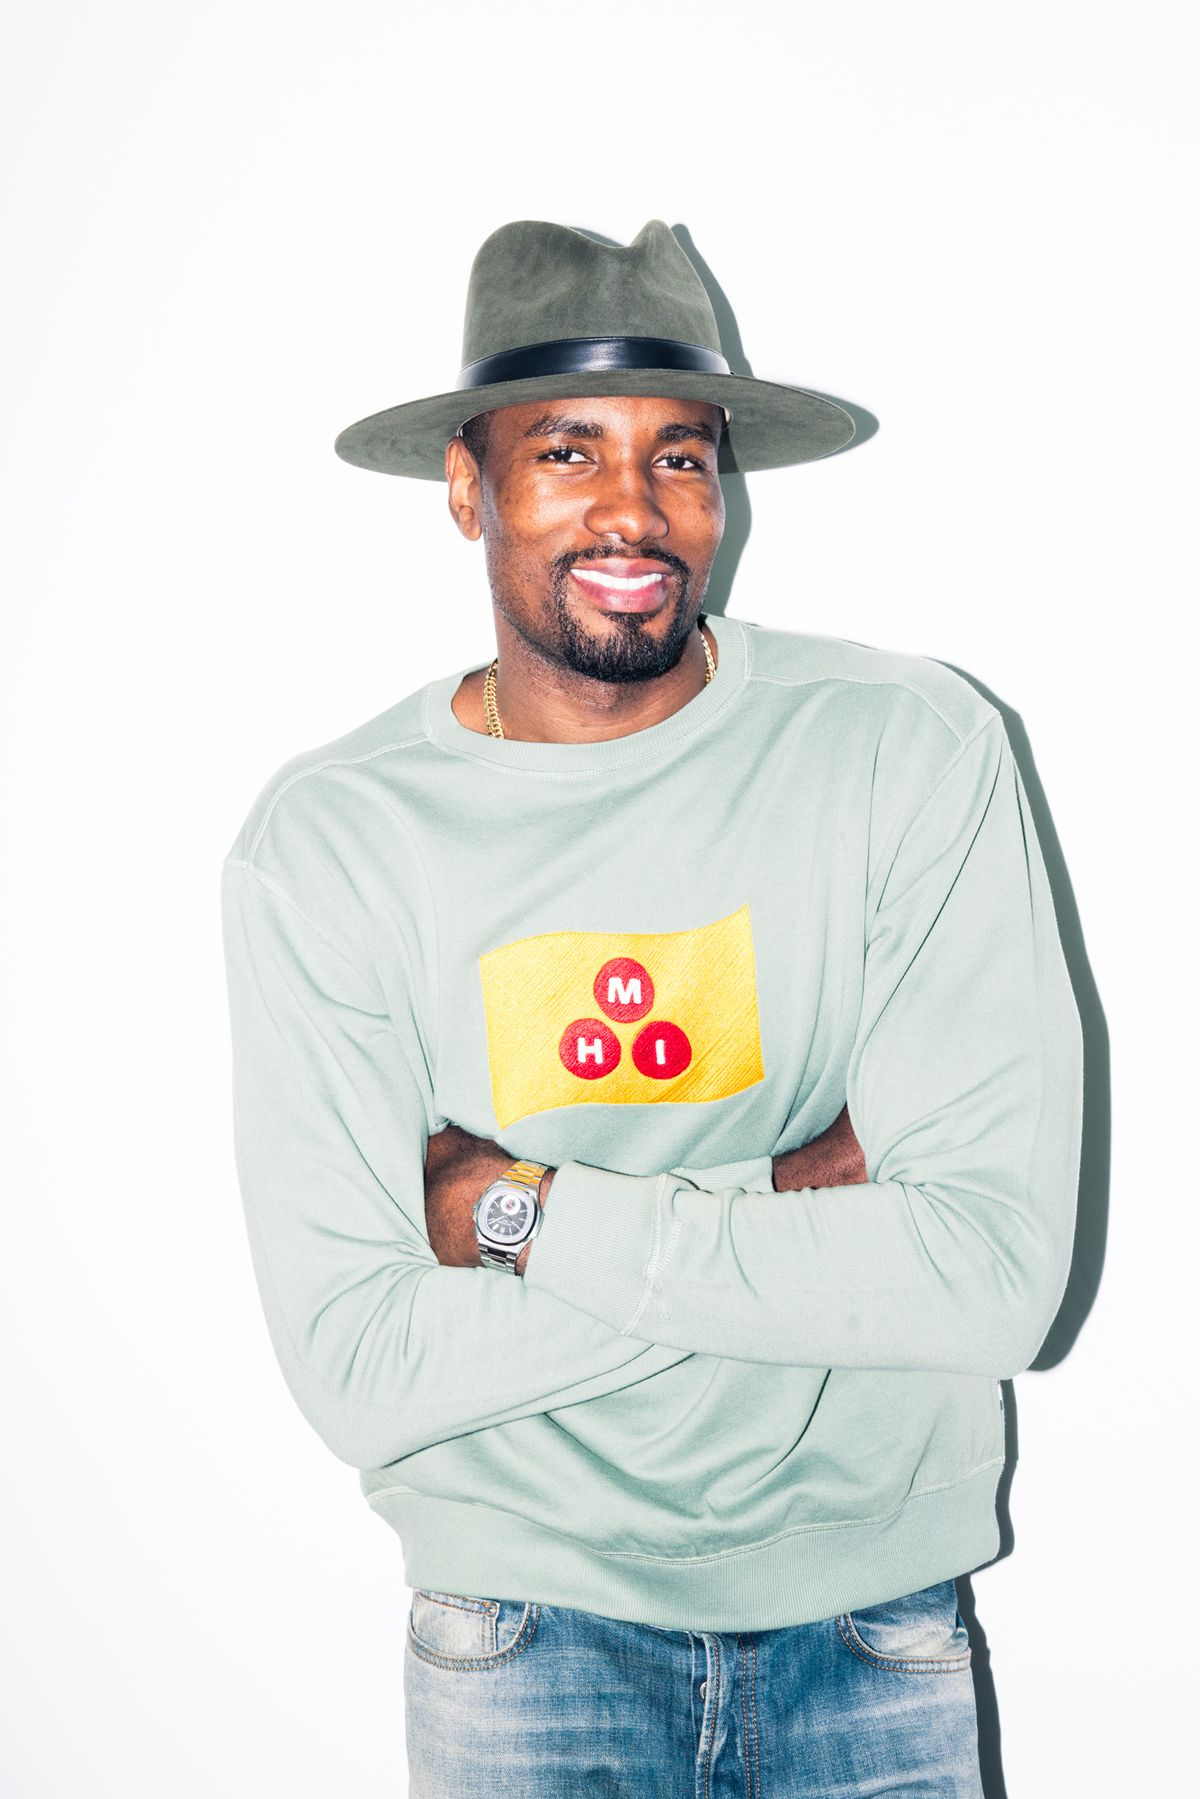 We Need to Talk about Serge Ibaka's Closet